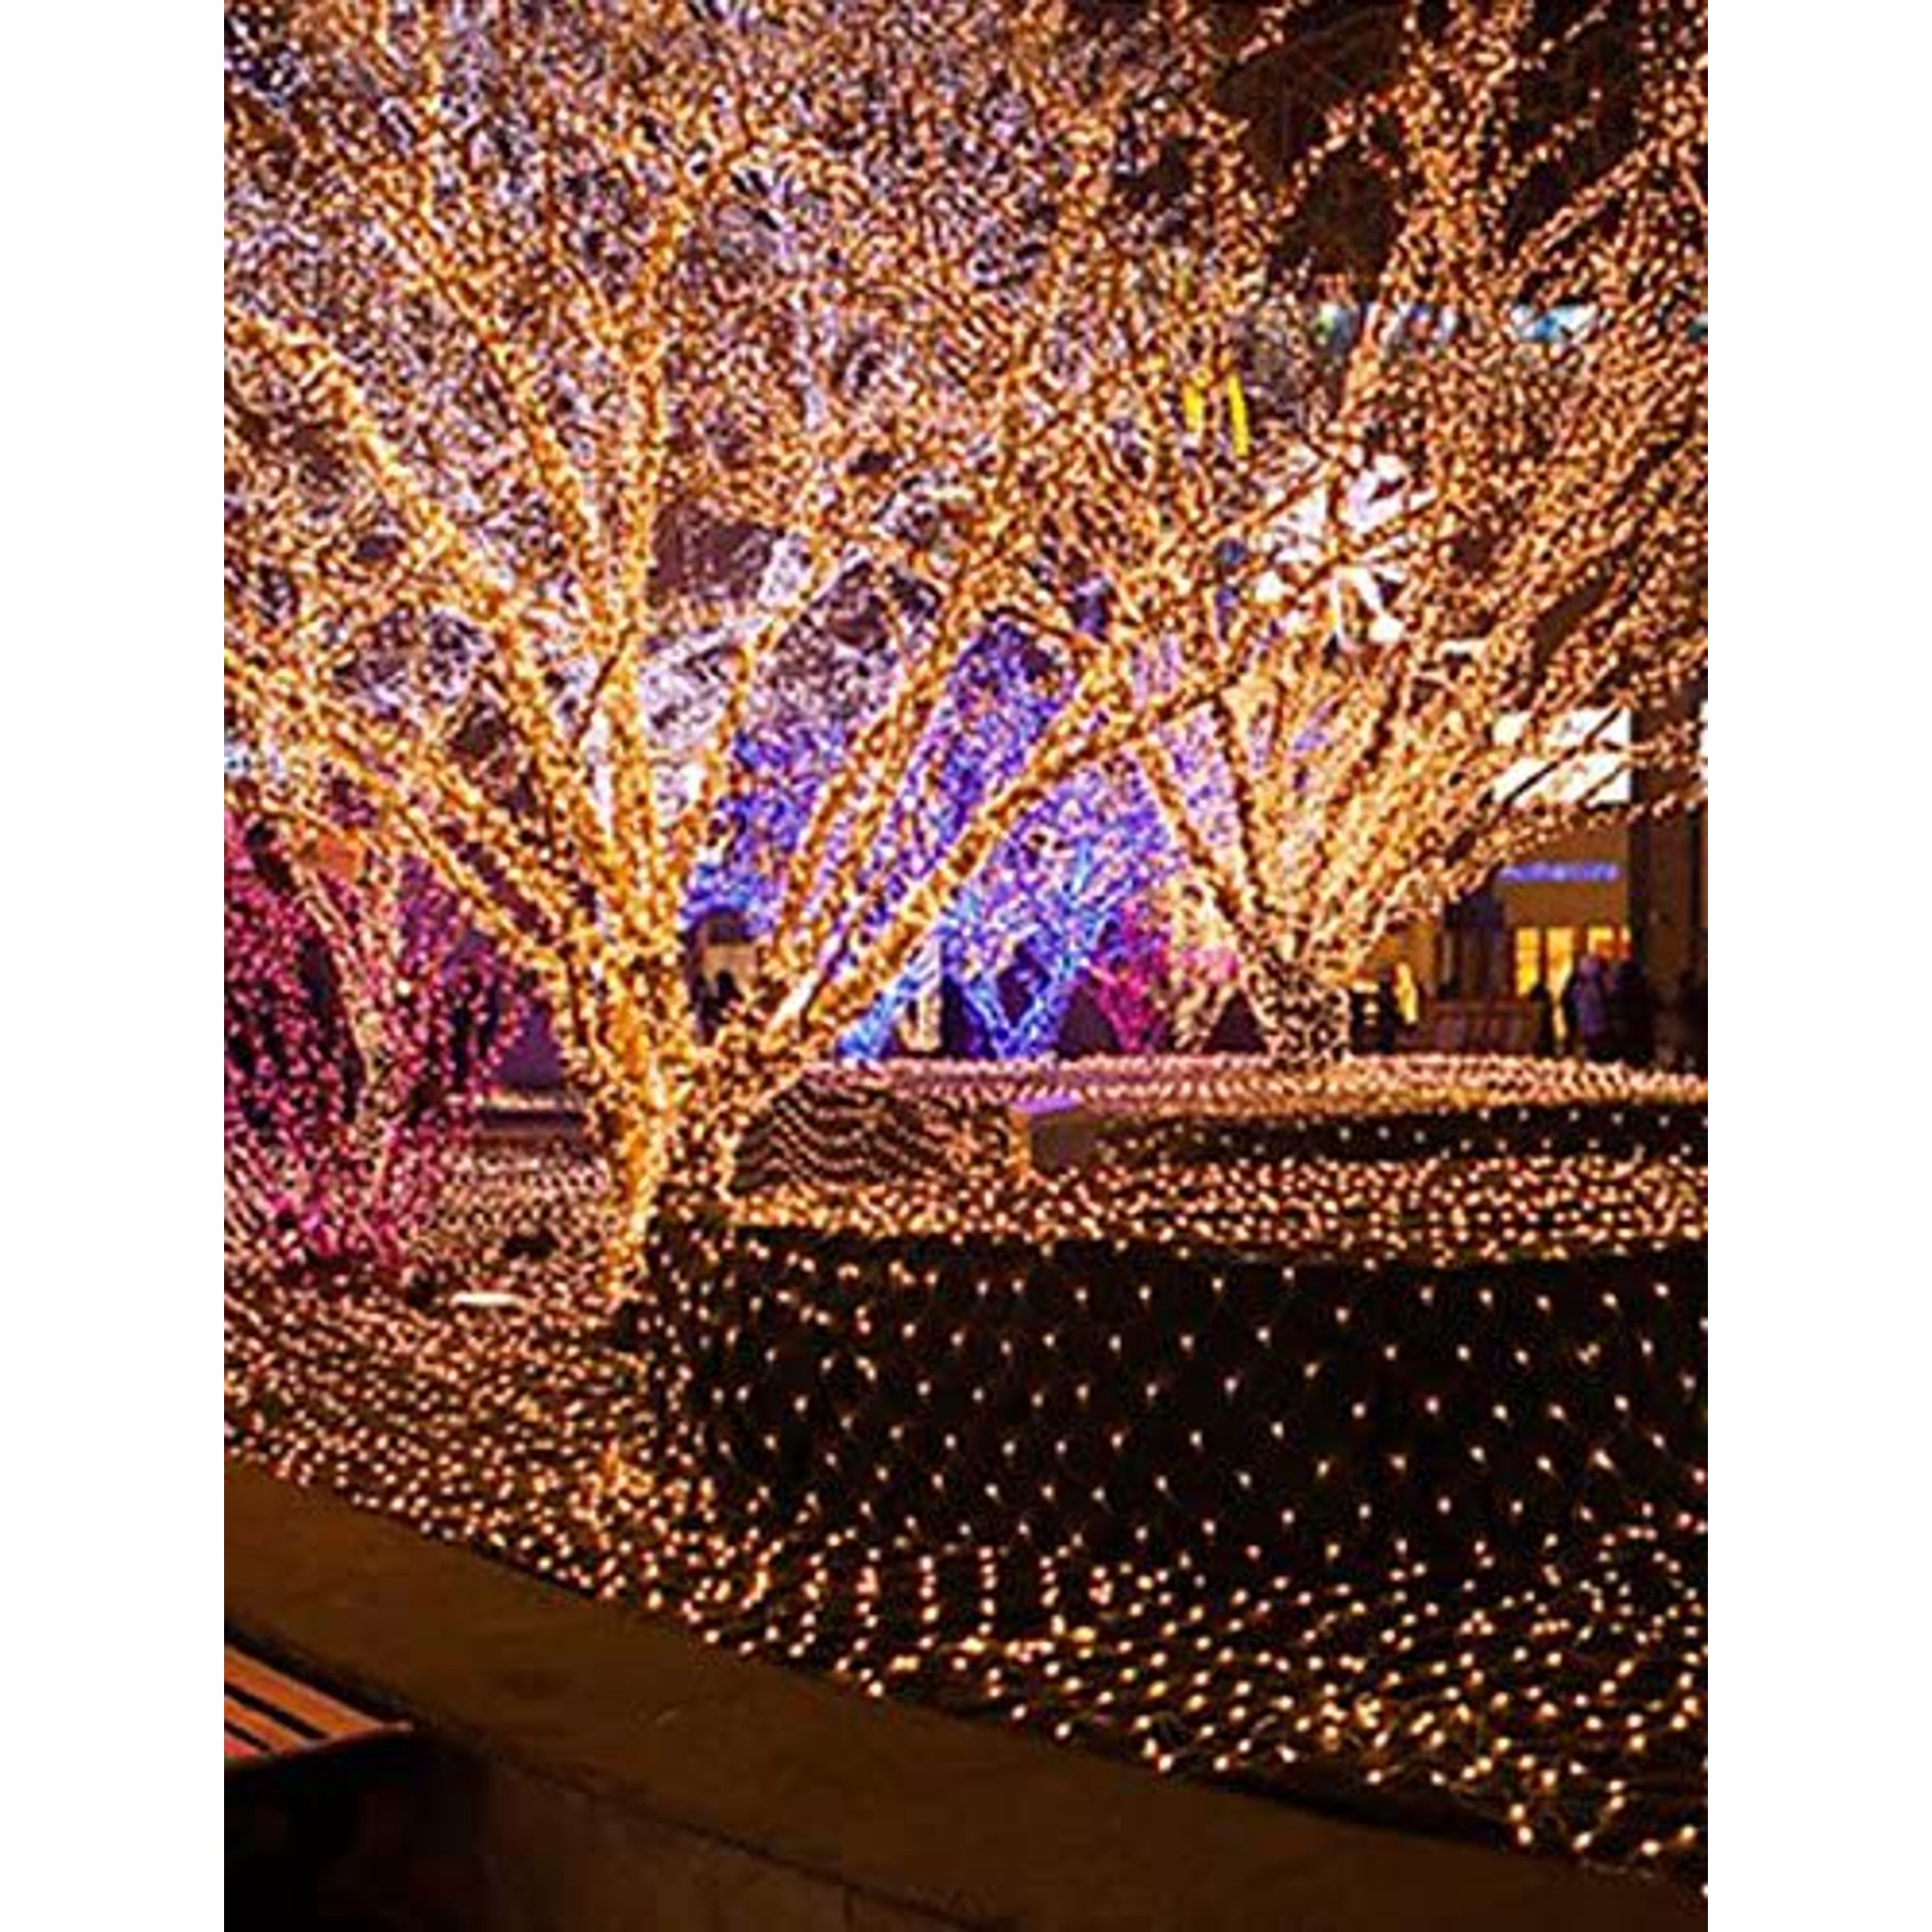 Christmas Net Light Waterproof Nets Bars Wedding Twinkle Waterfall Decoration Lamps Waterproof Light 3 2m 204led White Walmart Canada